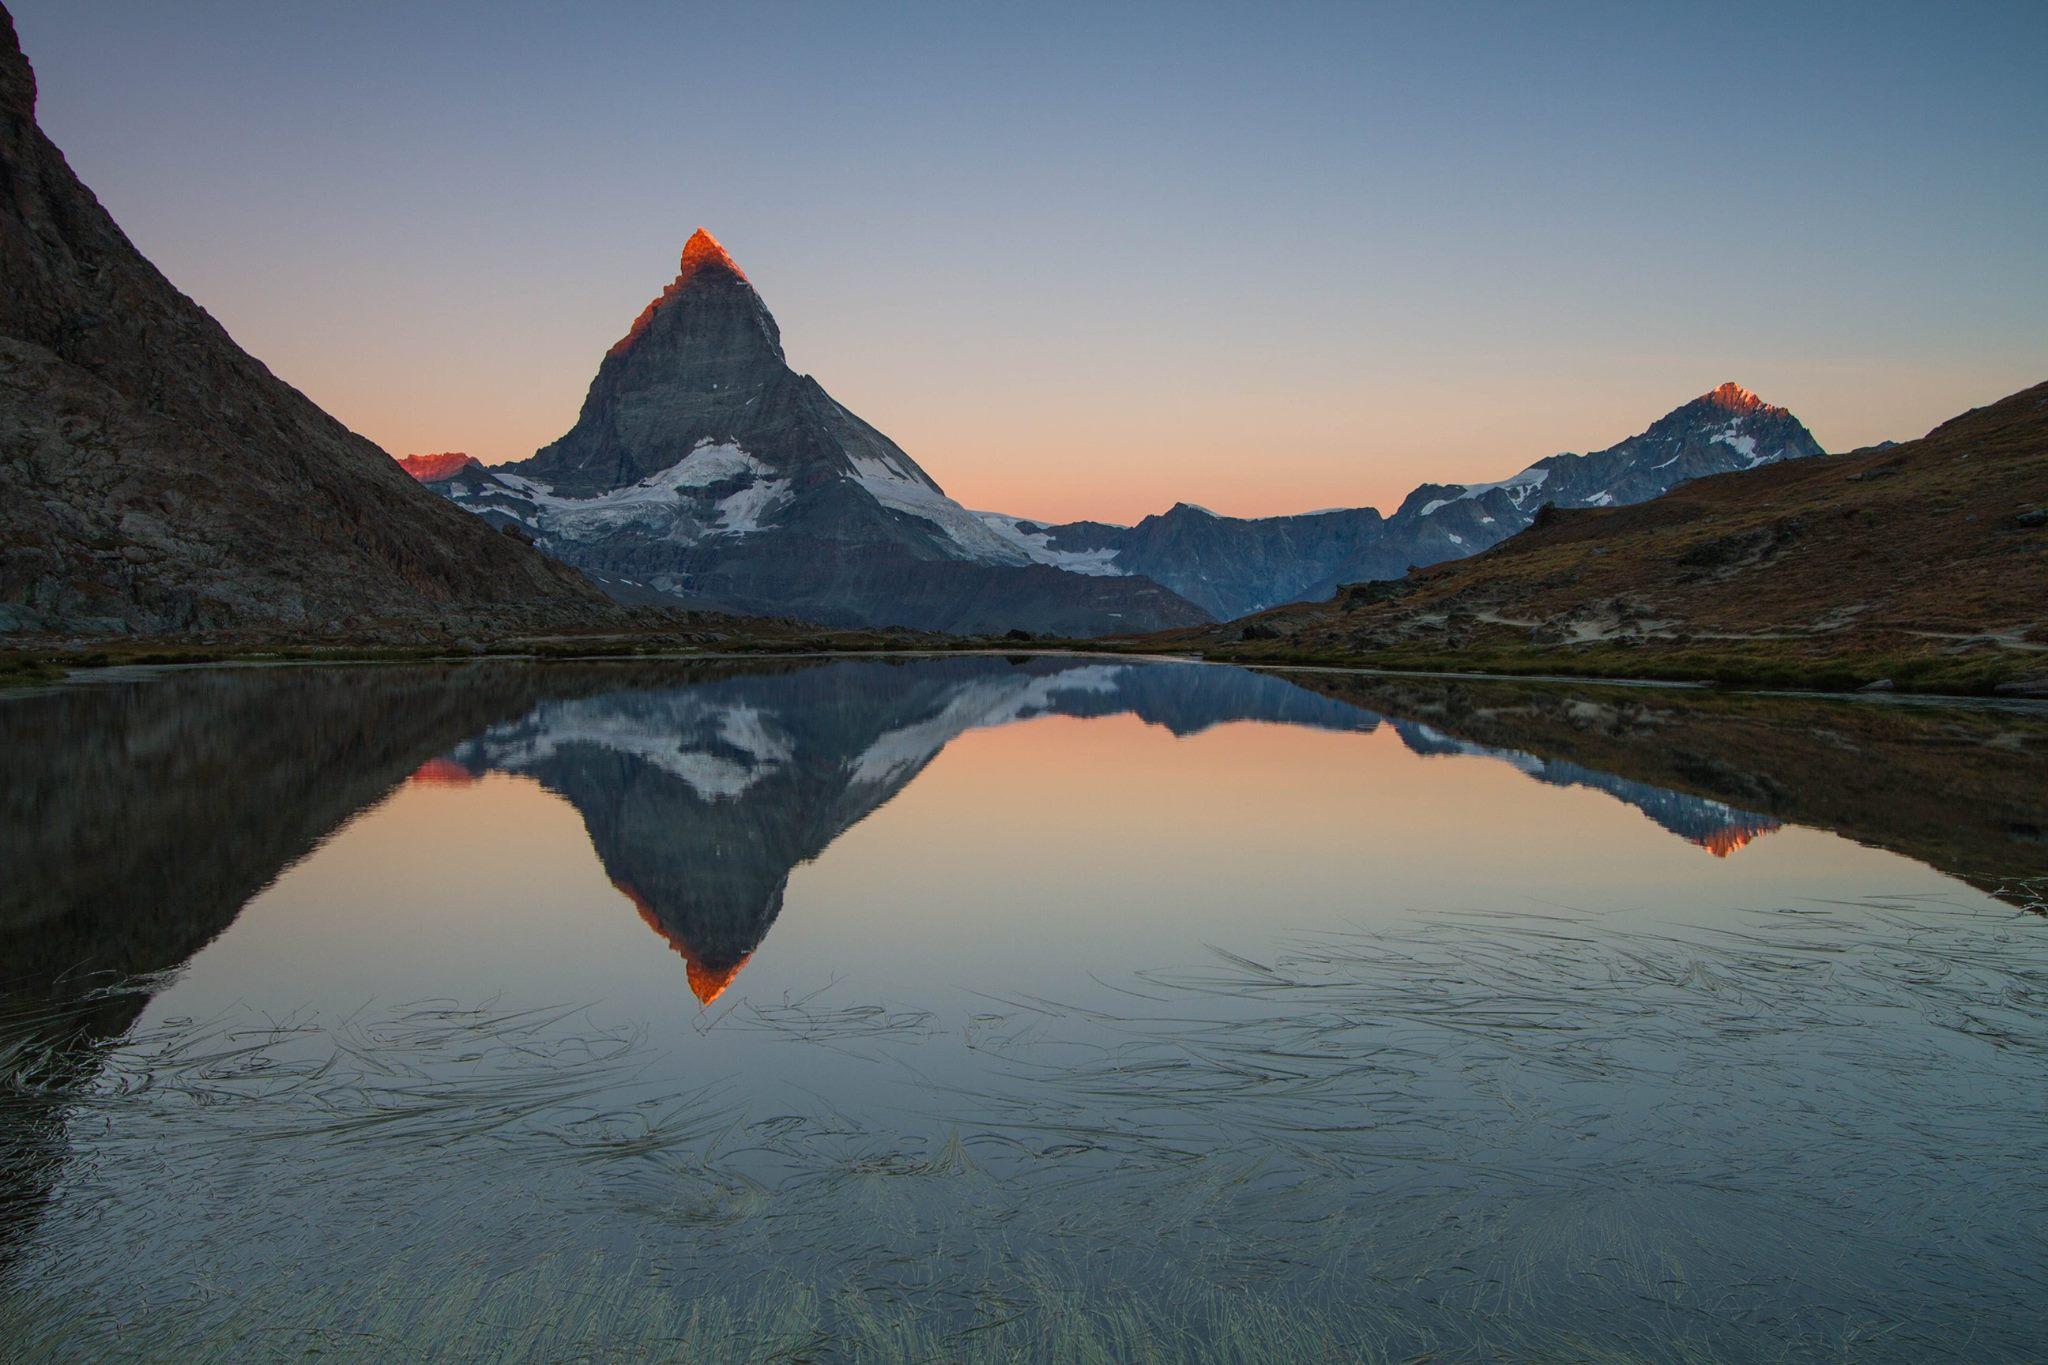 Riffelsee with Matterhorn reflection, Switzerland